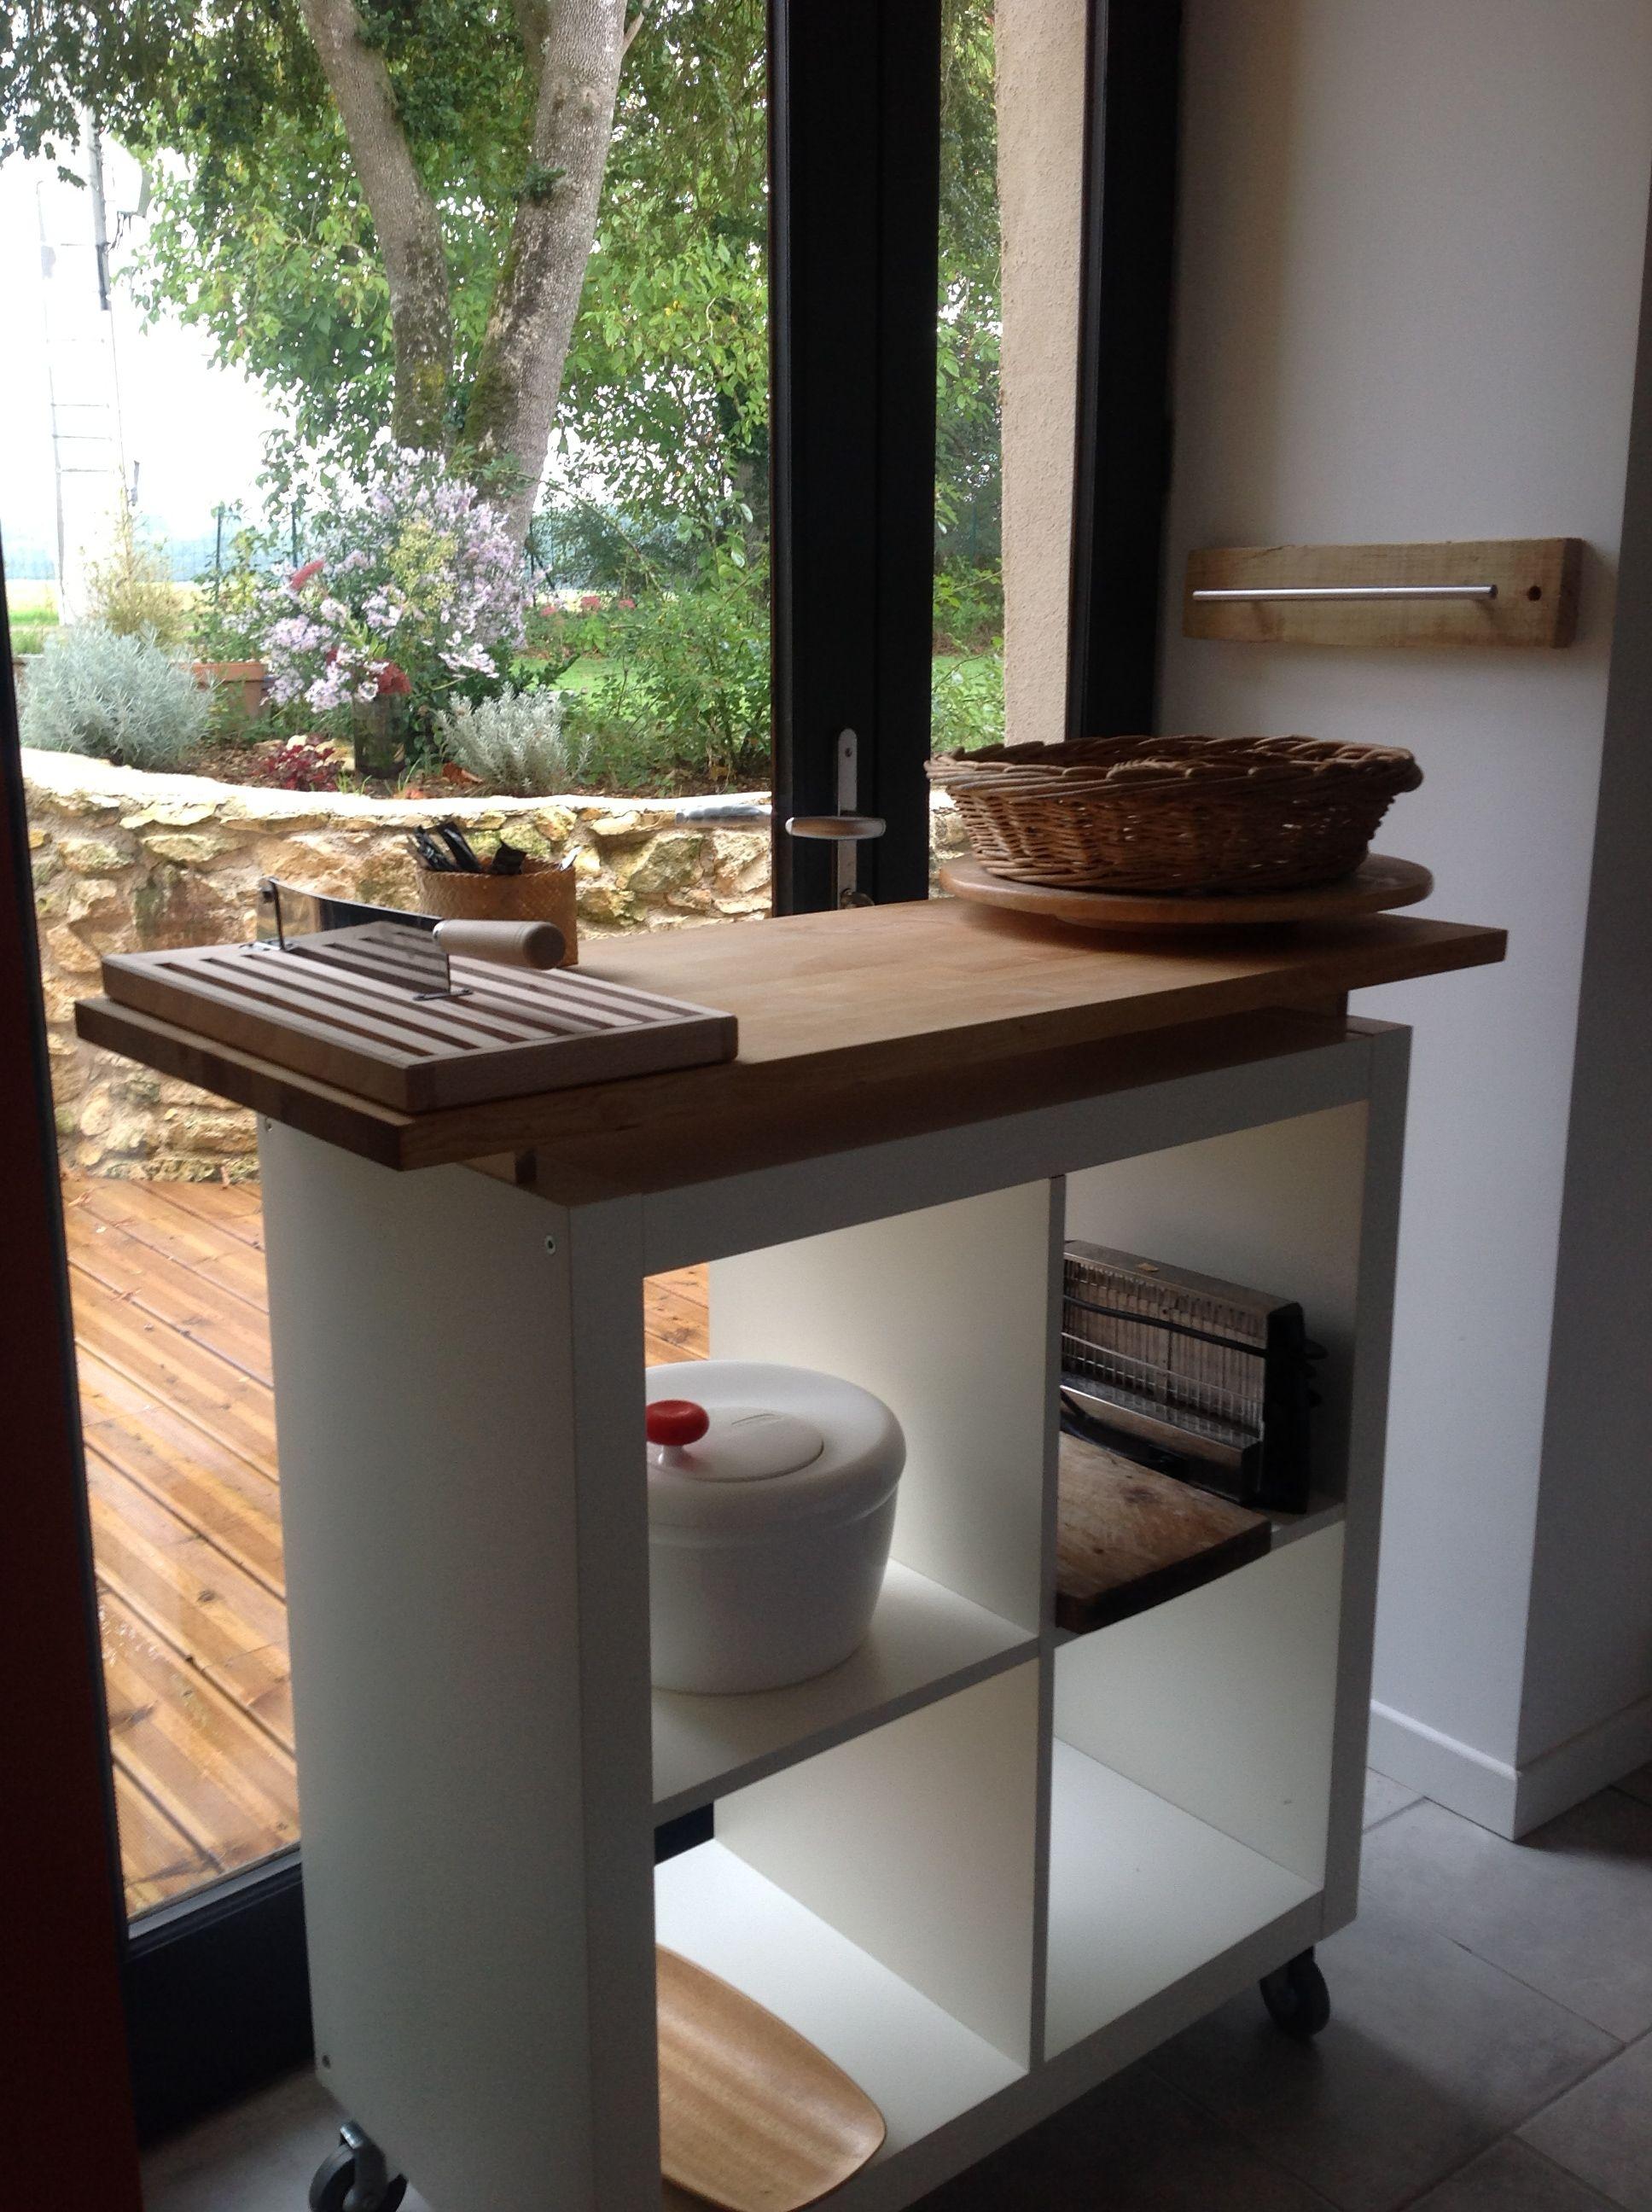 Meuble ikea transforme en desserte roulante deco meuble meuble desserte - Ikea desserte cuisine ...